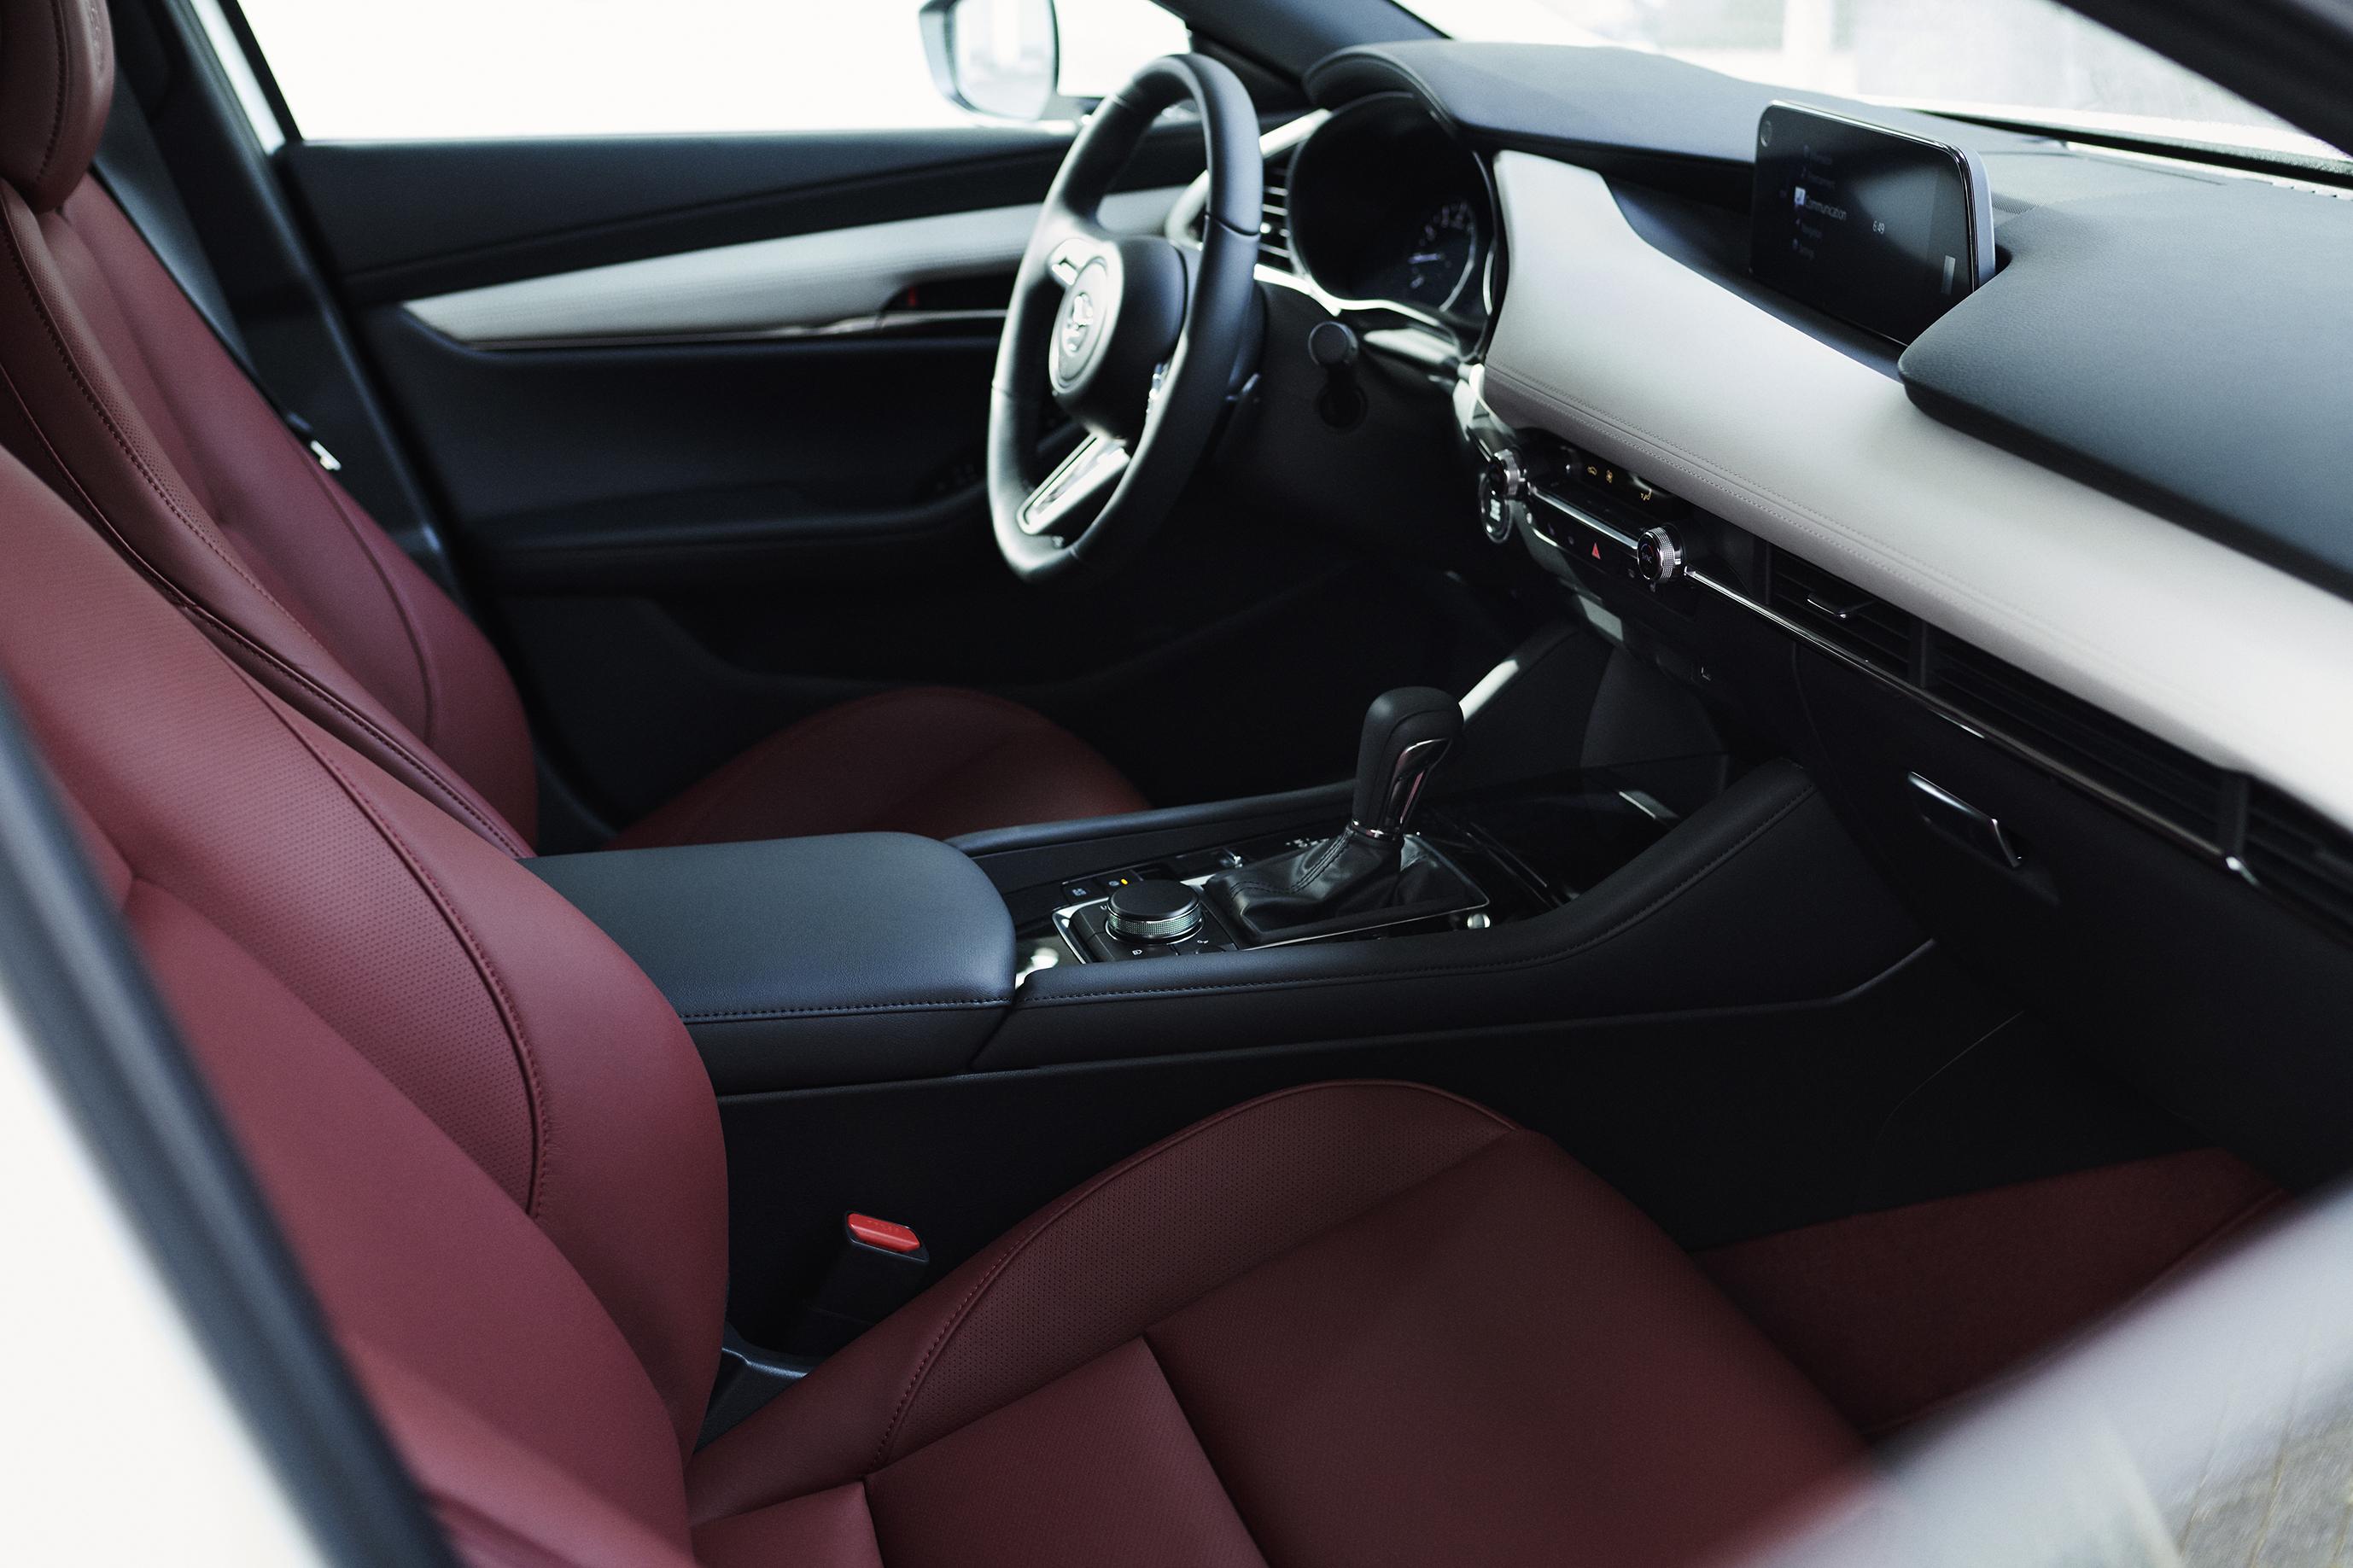 2020_100thSV_BRD15_EU_LHD_Mazda3_Interior_L.jpg